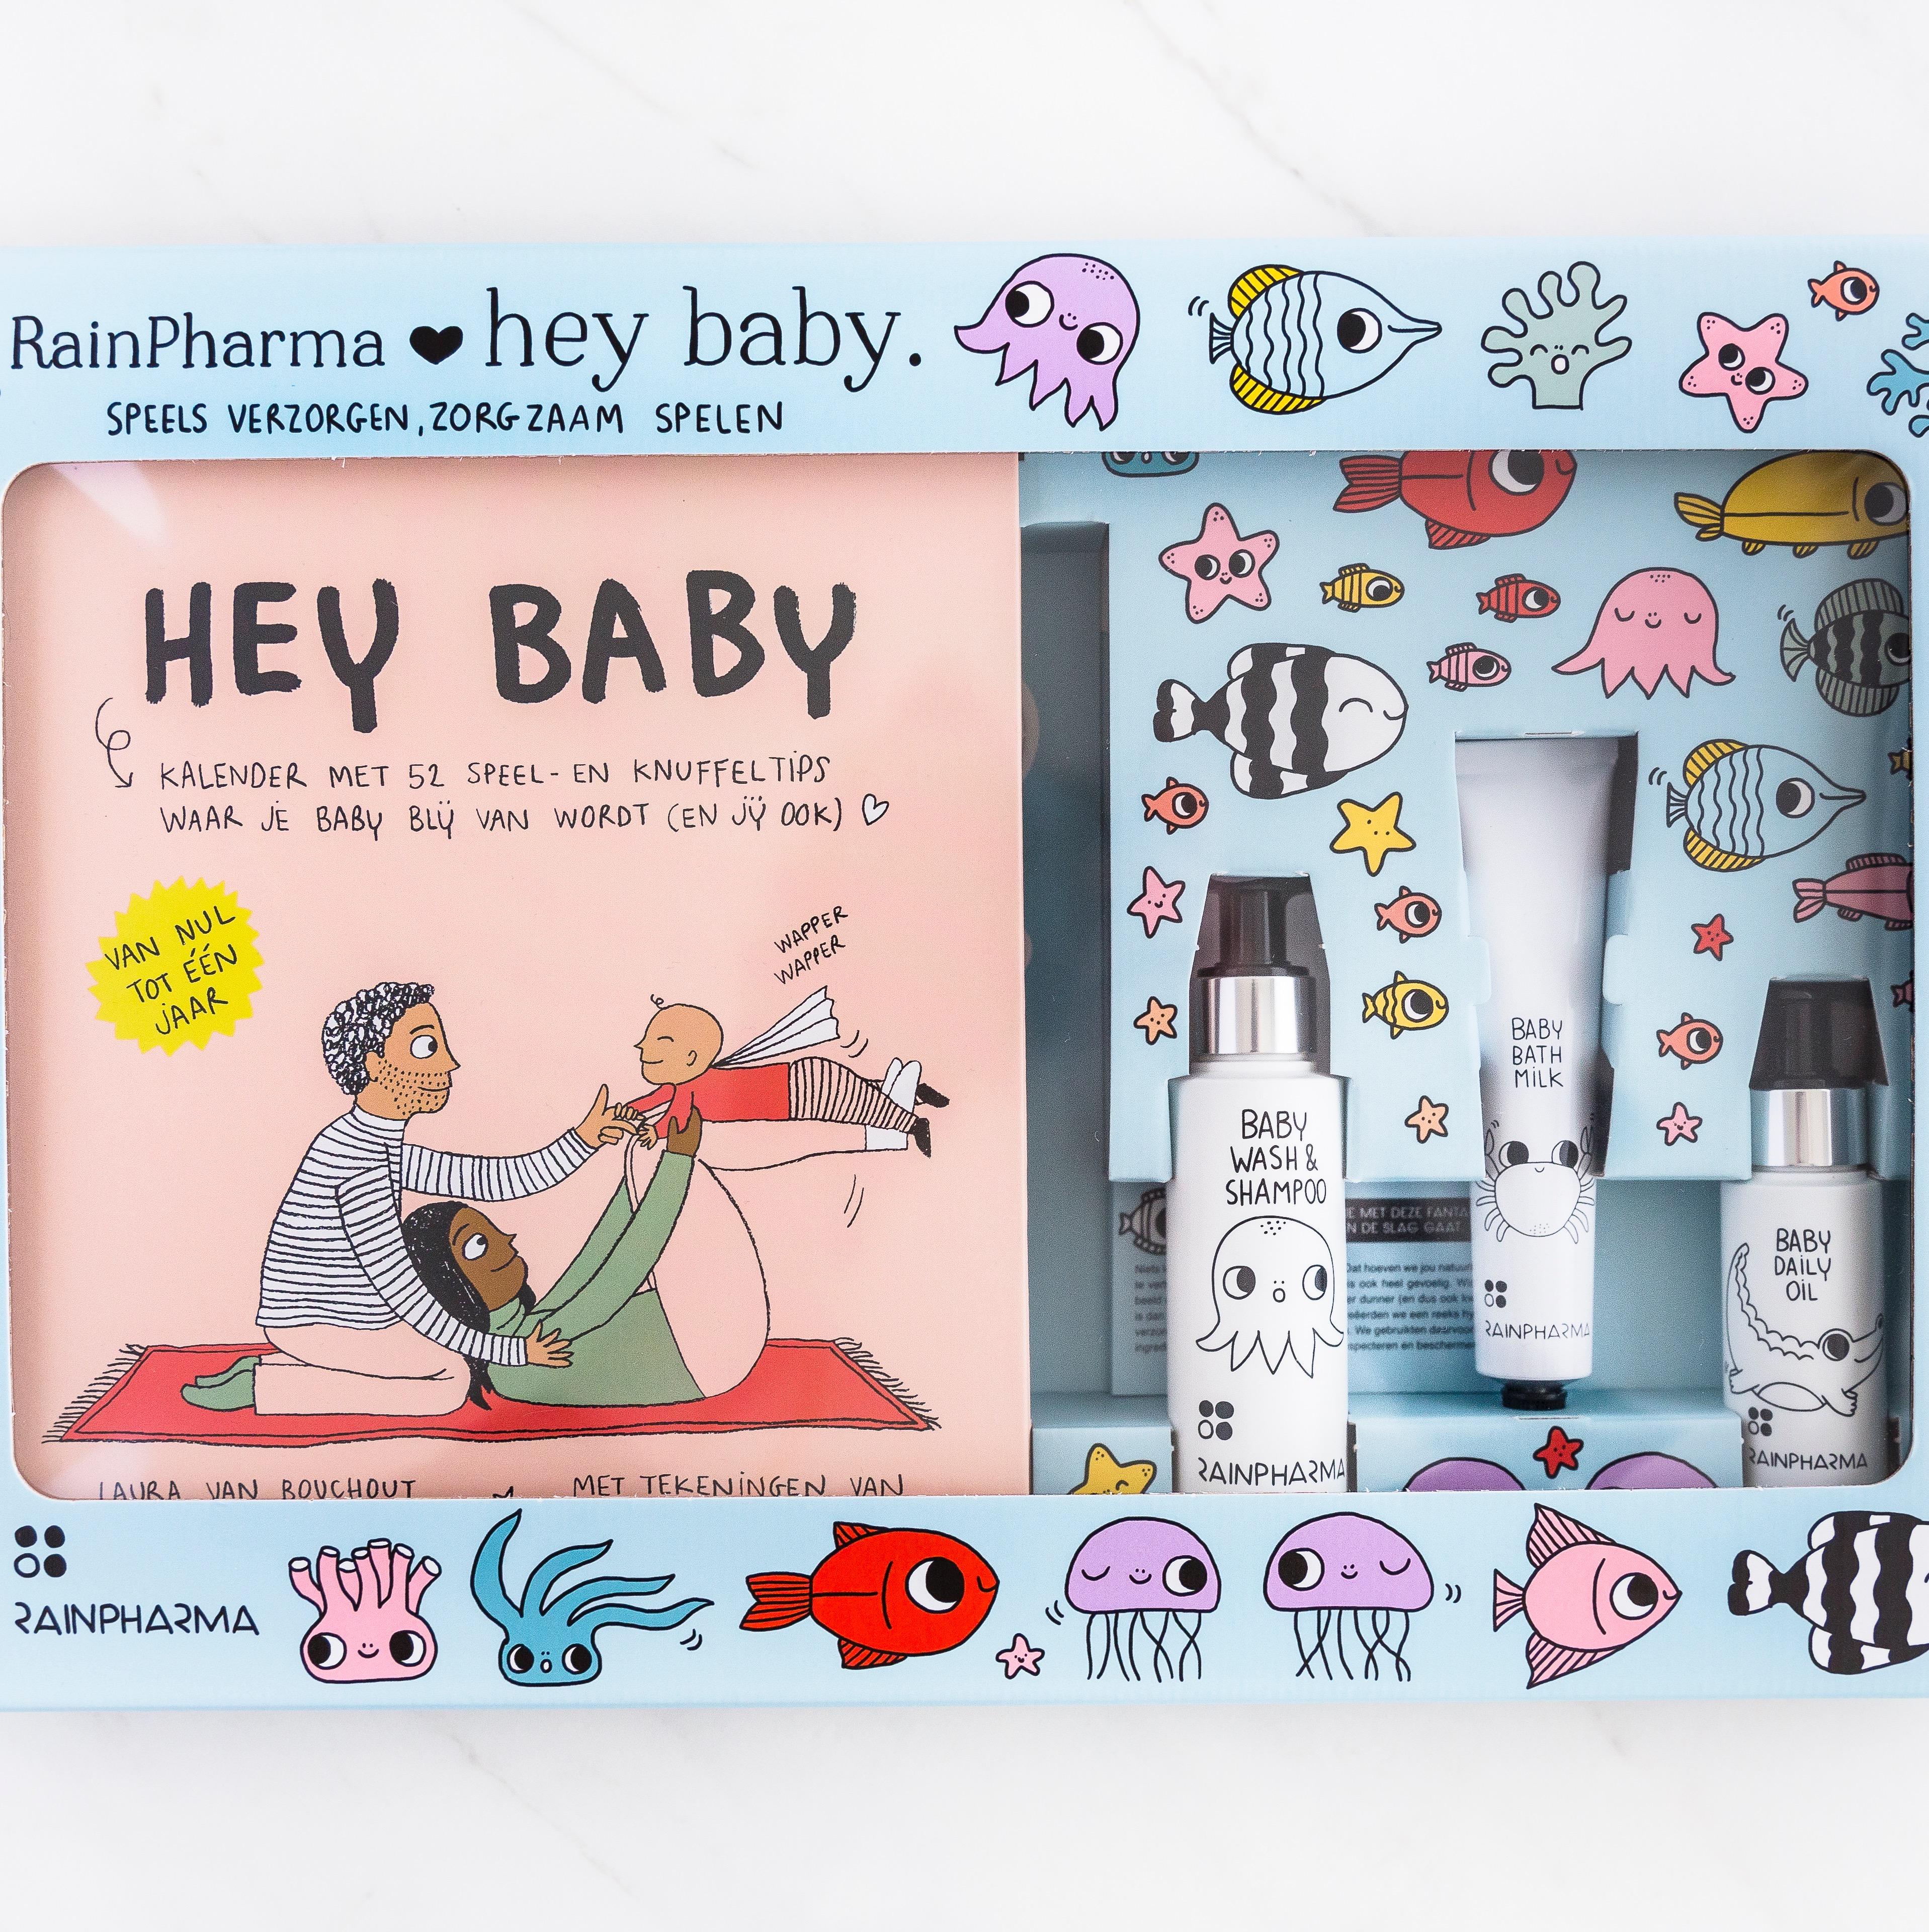 rainpharma-x-hey-baby-box